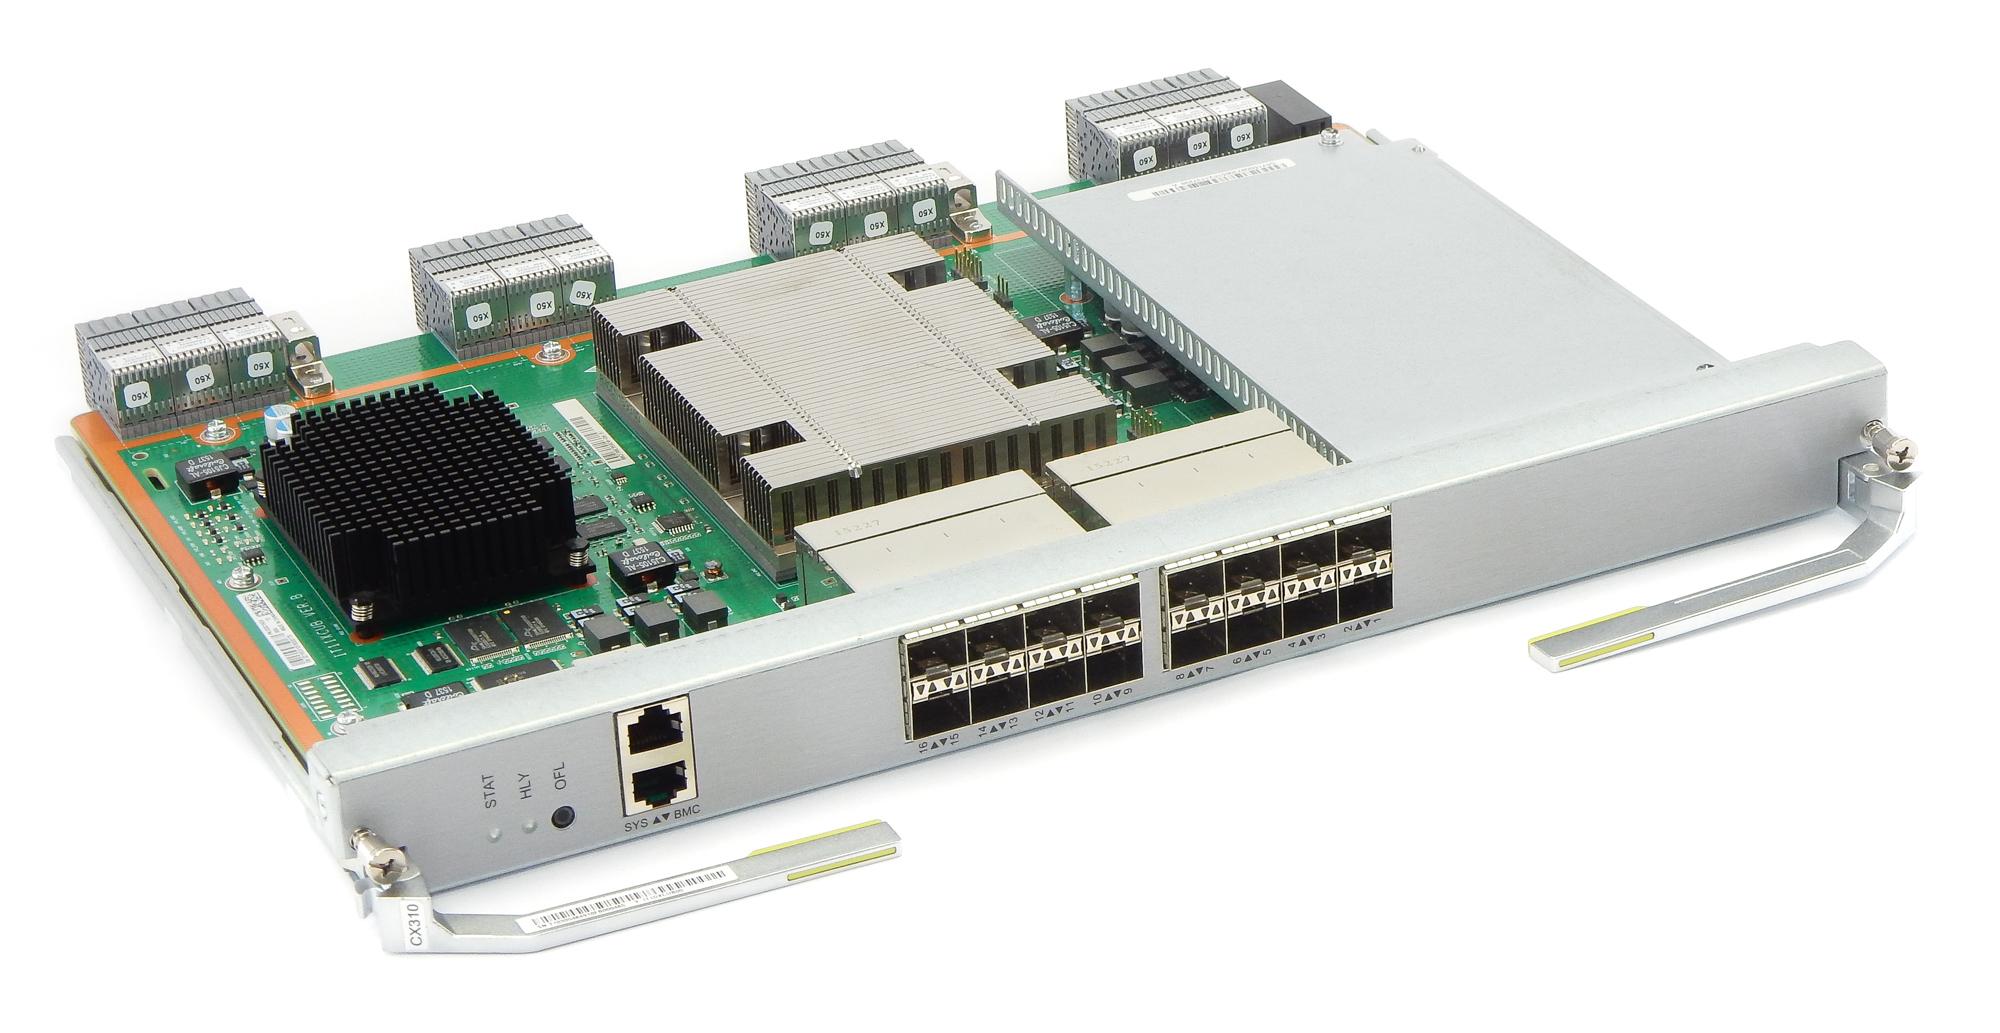 Huawei IT1DXCUB00 CX310 16x10GE Converged Switch Module